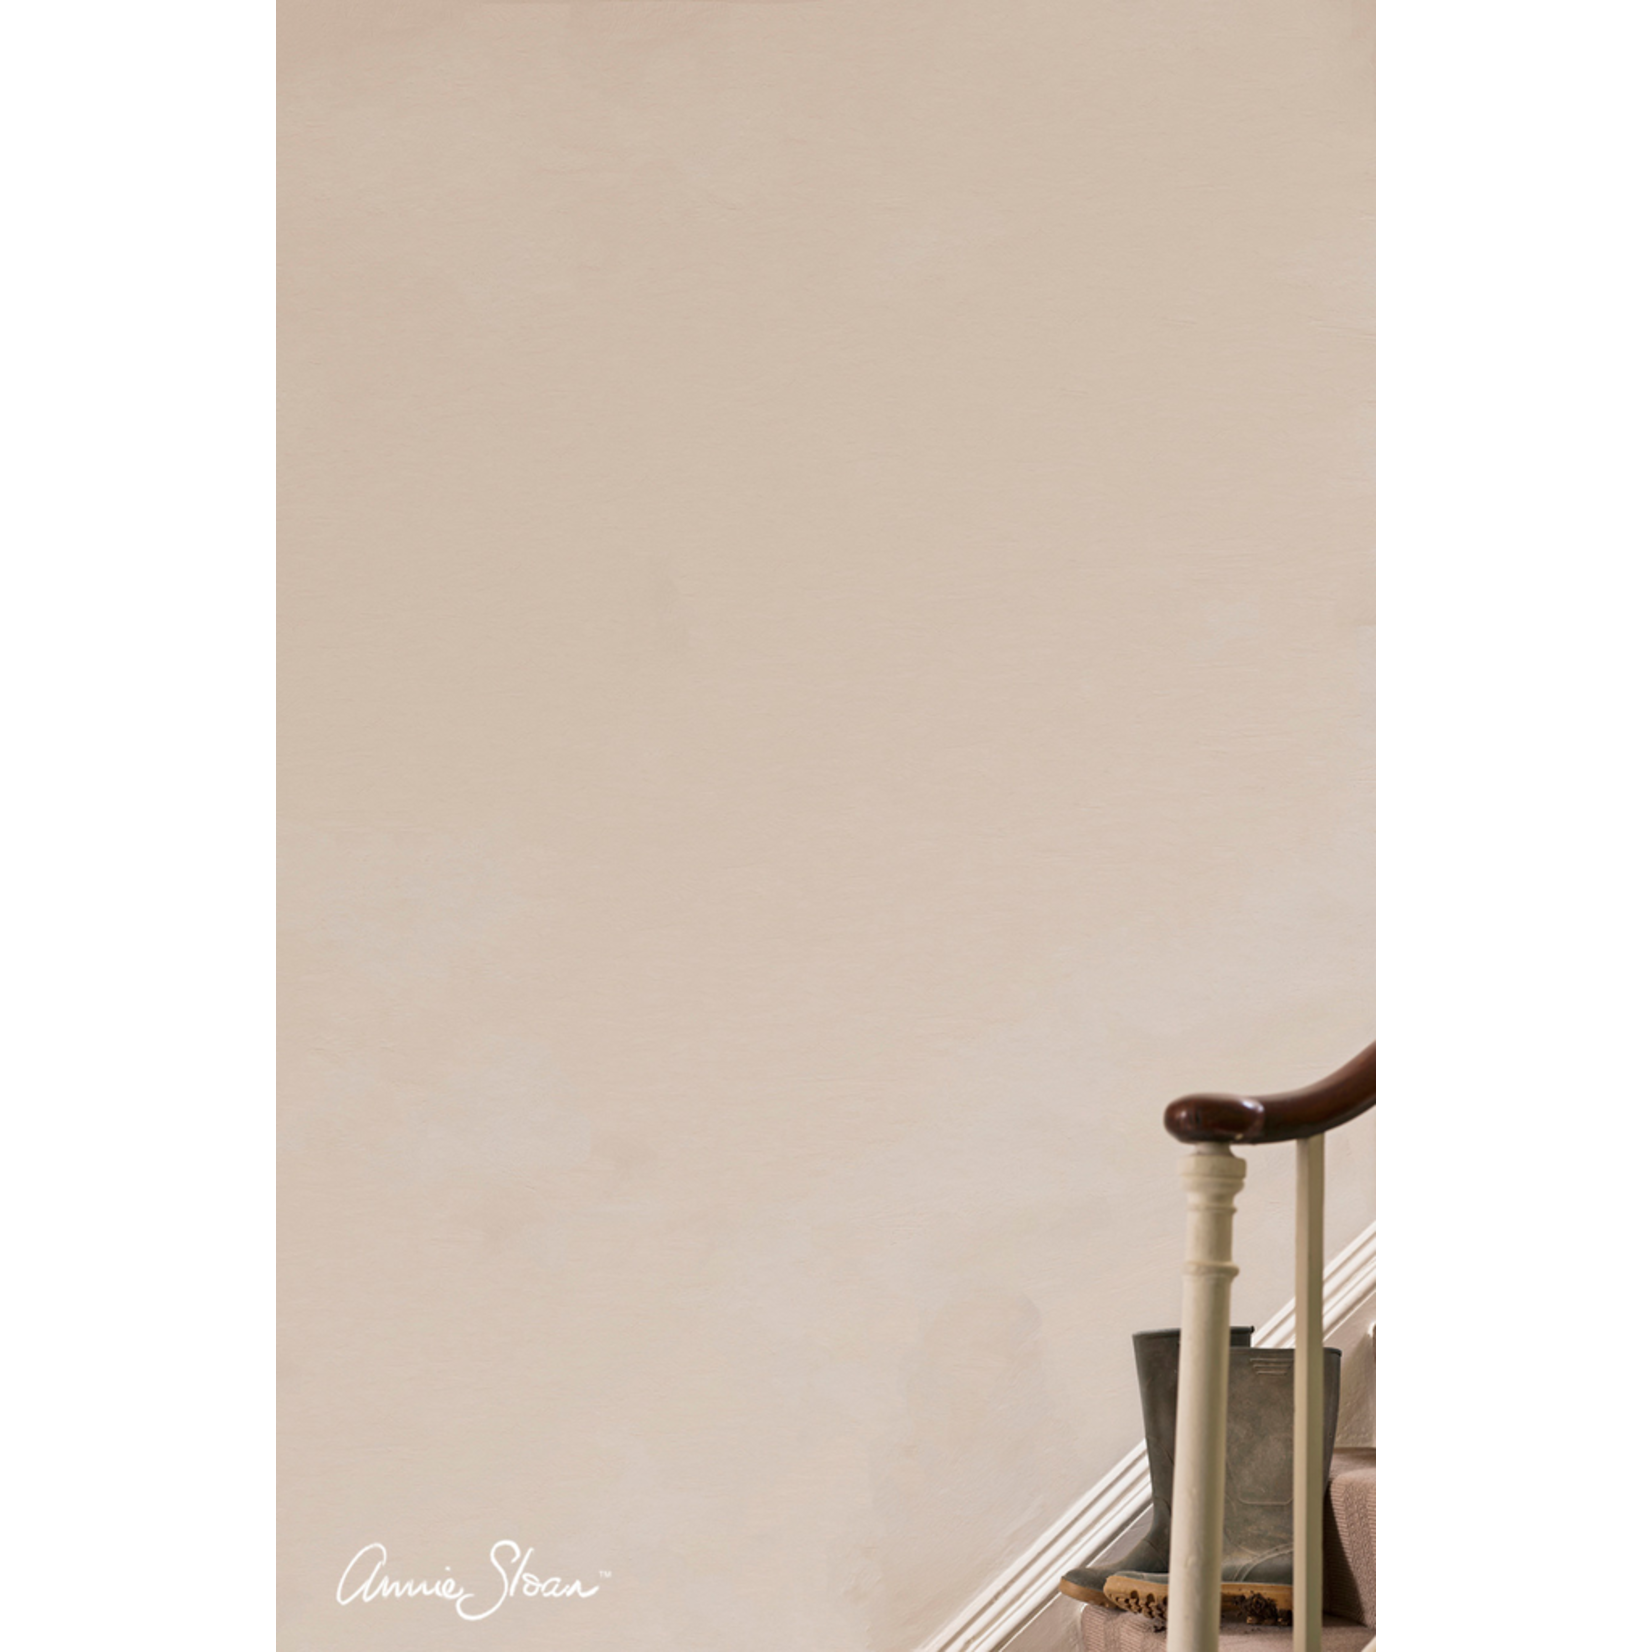 Annie Sloan Annie Sloan Old Ochre wall paint